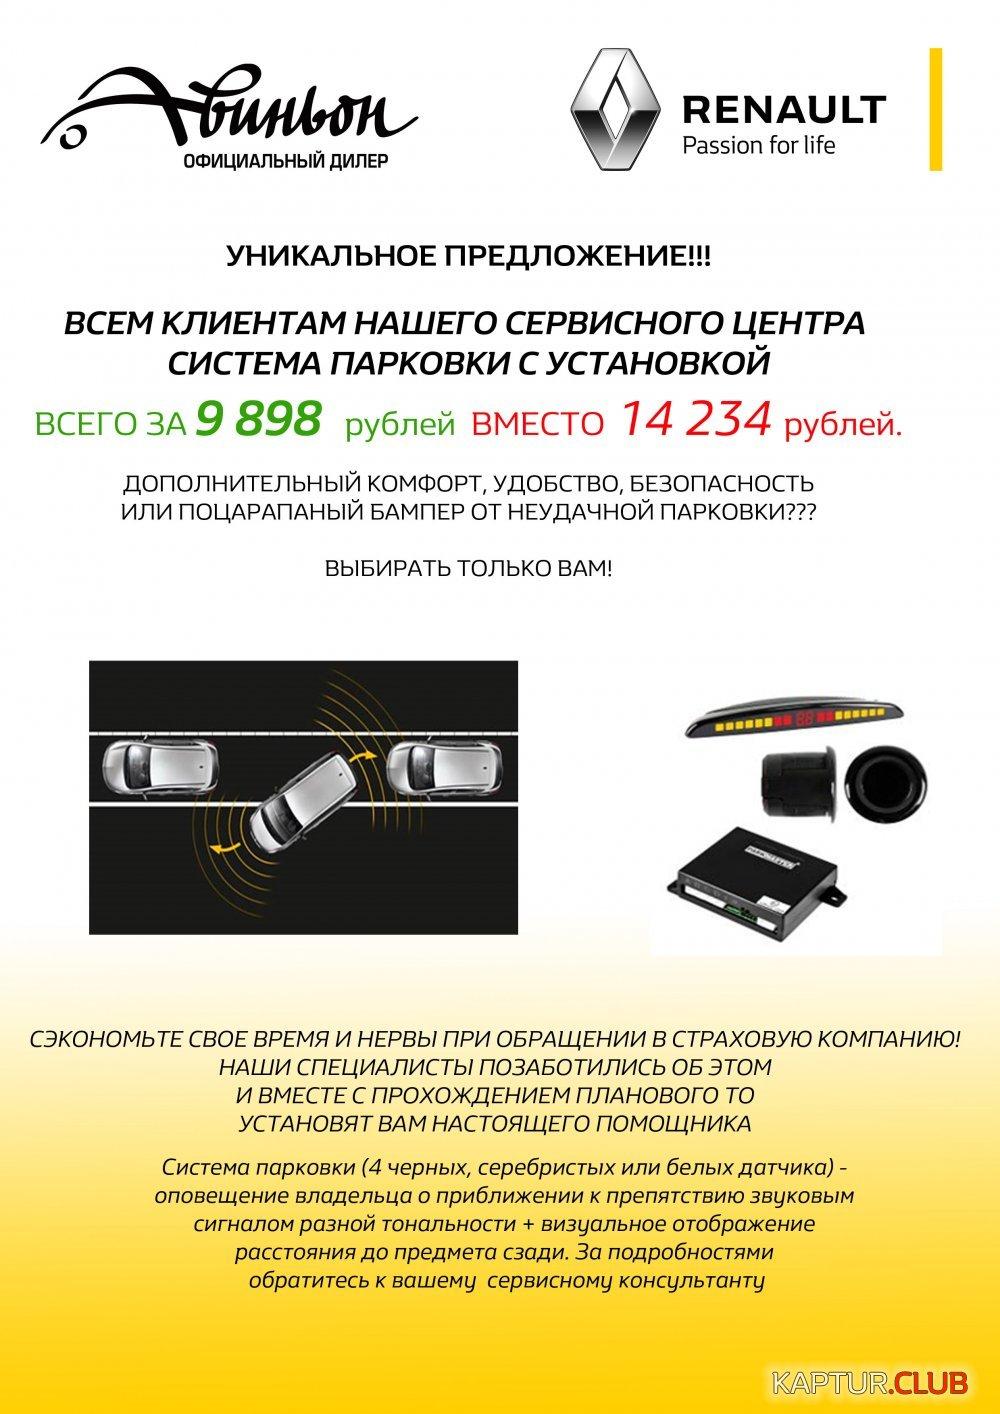 ПАРКОВКА.jpg | Рено Каптур Клуб Россия | Форум KAPTUR.club